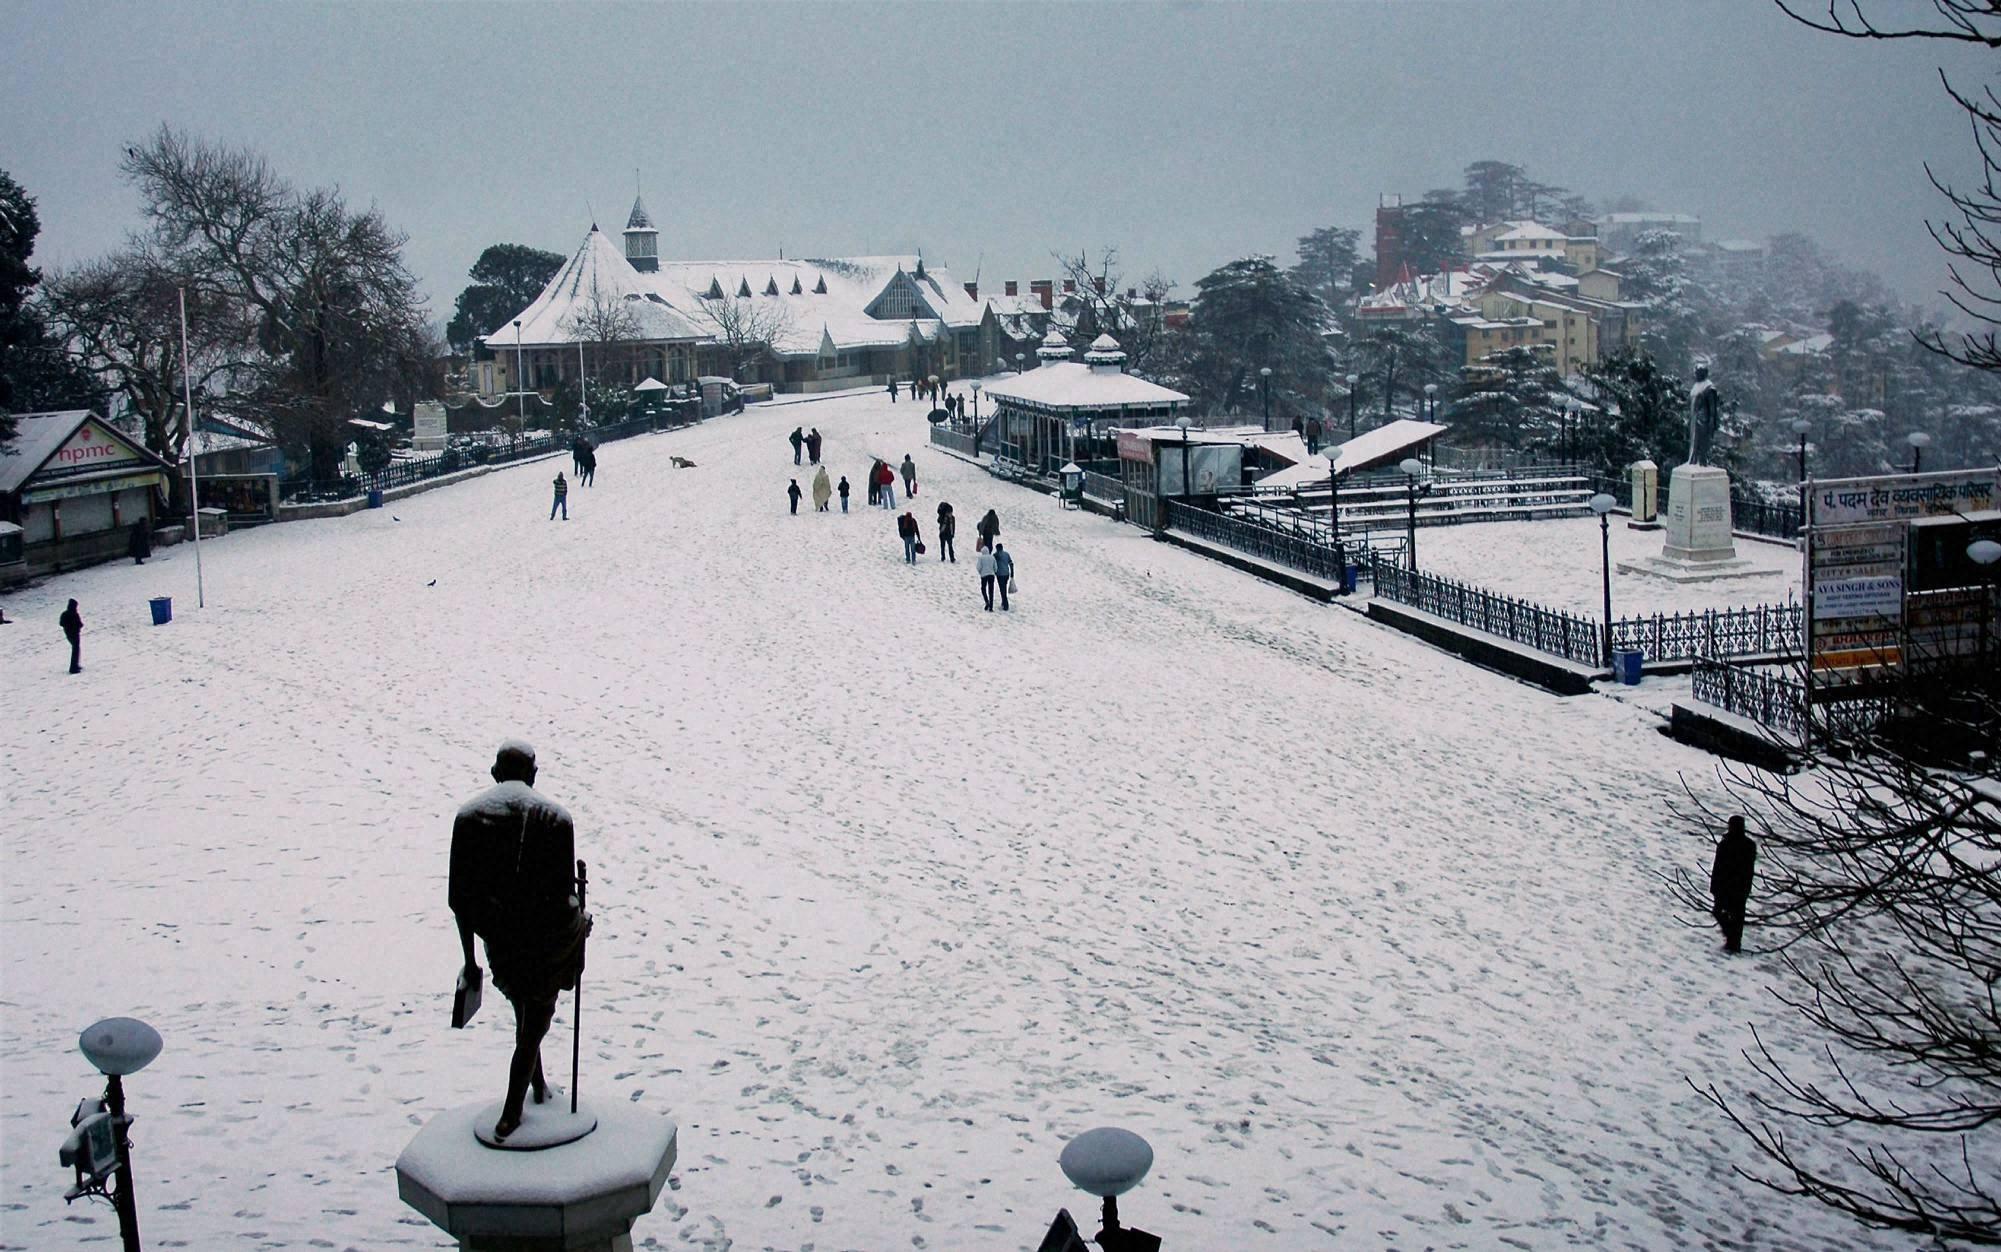 Book Shimla Manali Tour Id 4438 6 Days 5 Nights